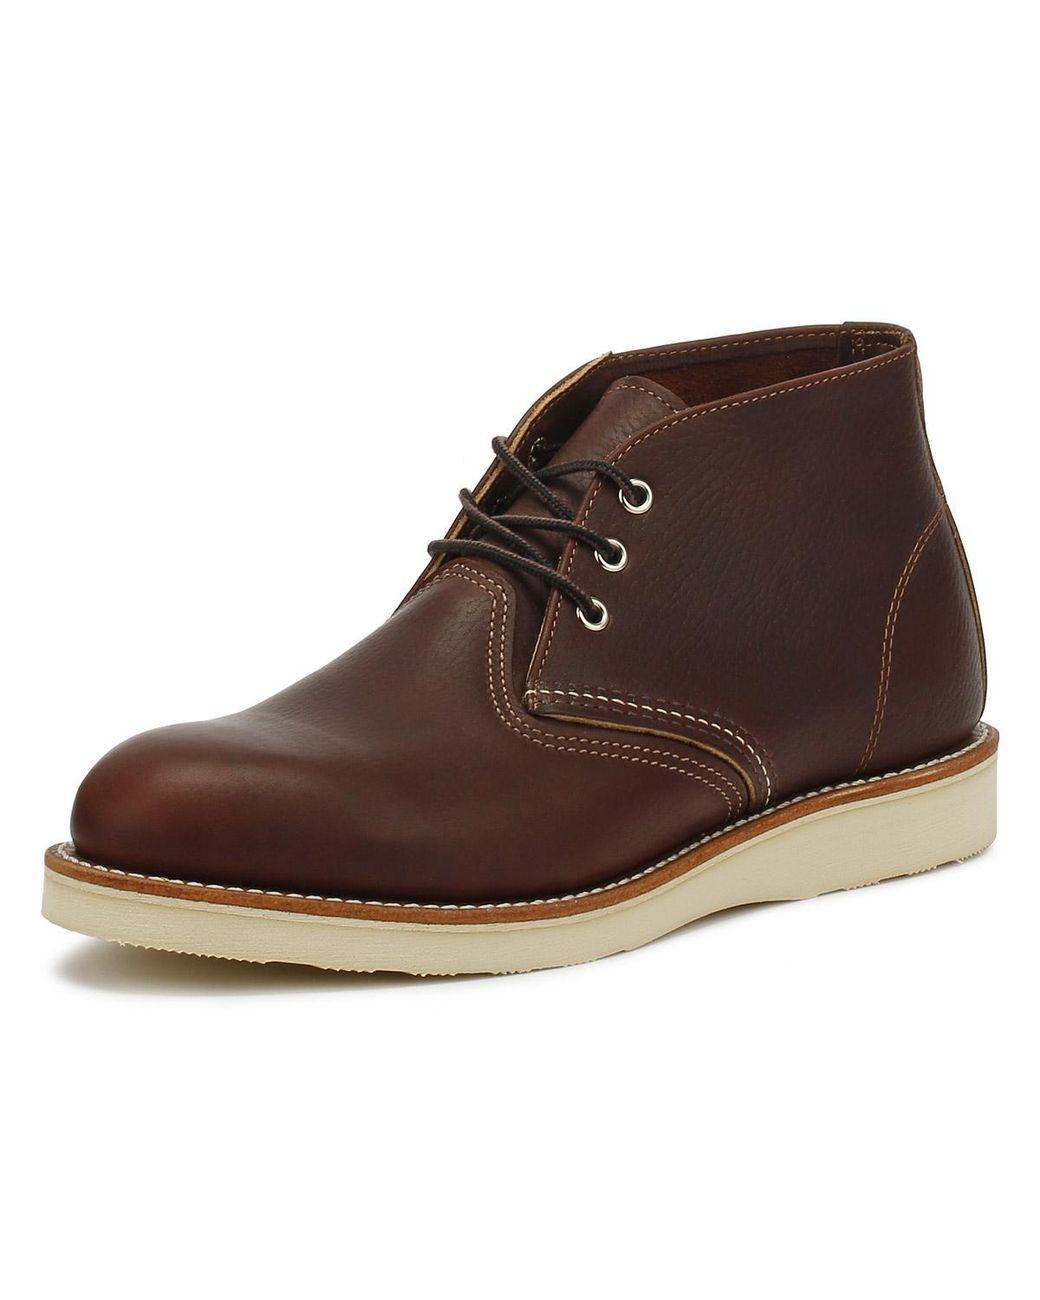 df6c1397ebb Red Wing - Mens Briar Oil Slick Dark Brown Chukka Boots for Men - Lyst